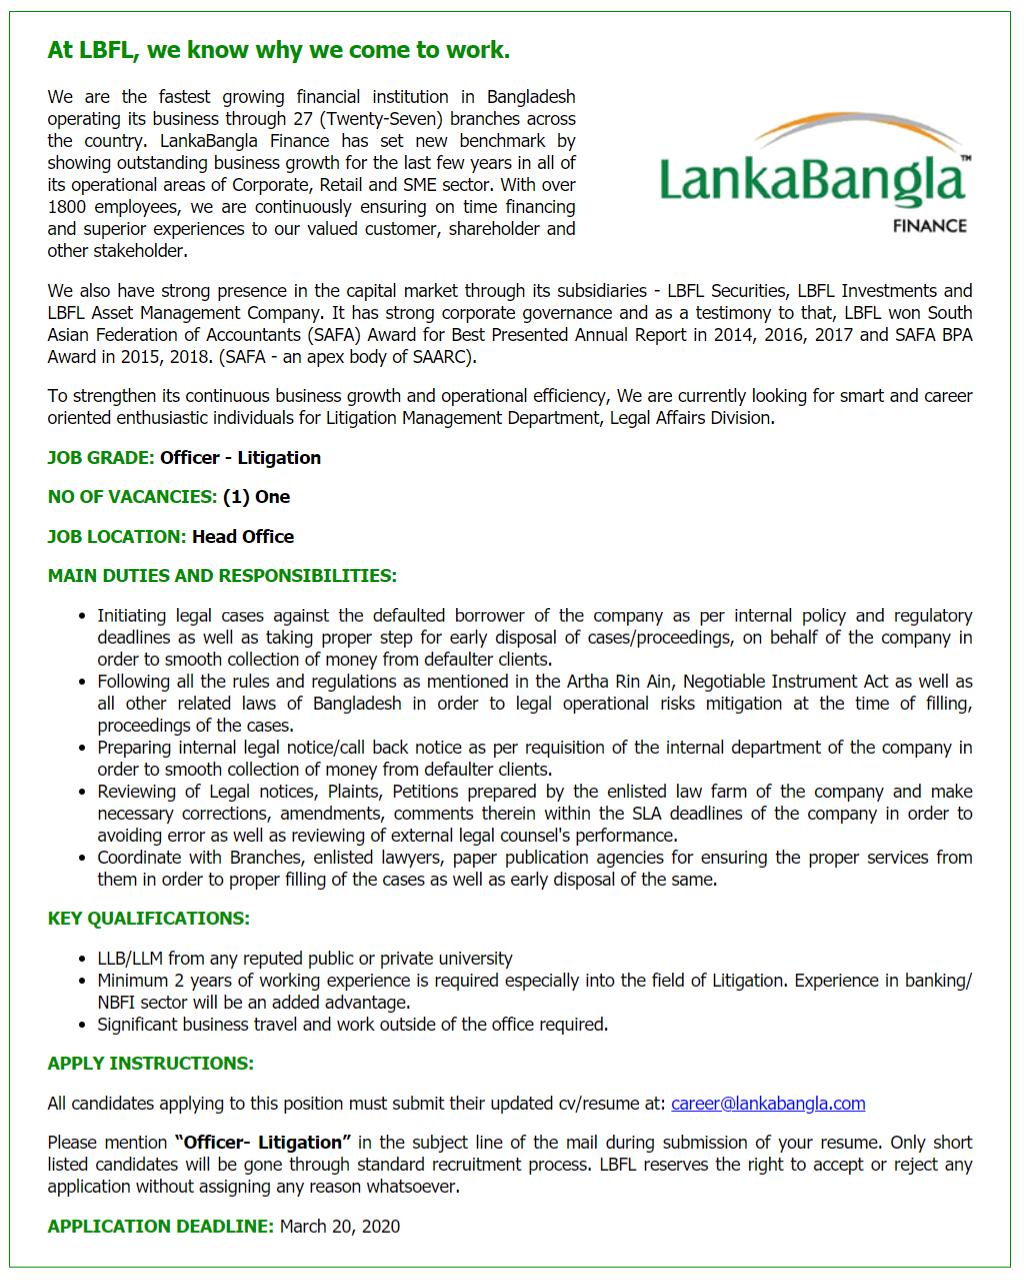 LankaBangla Finance (LBFL) Job Circular 2020